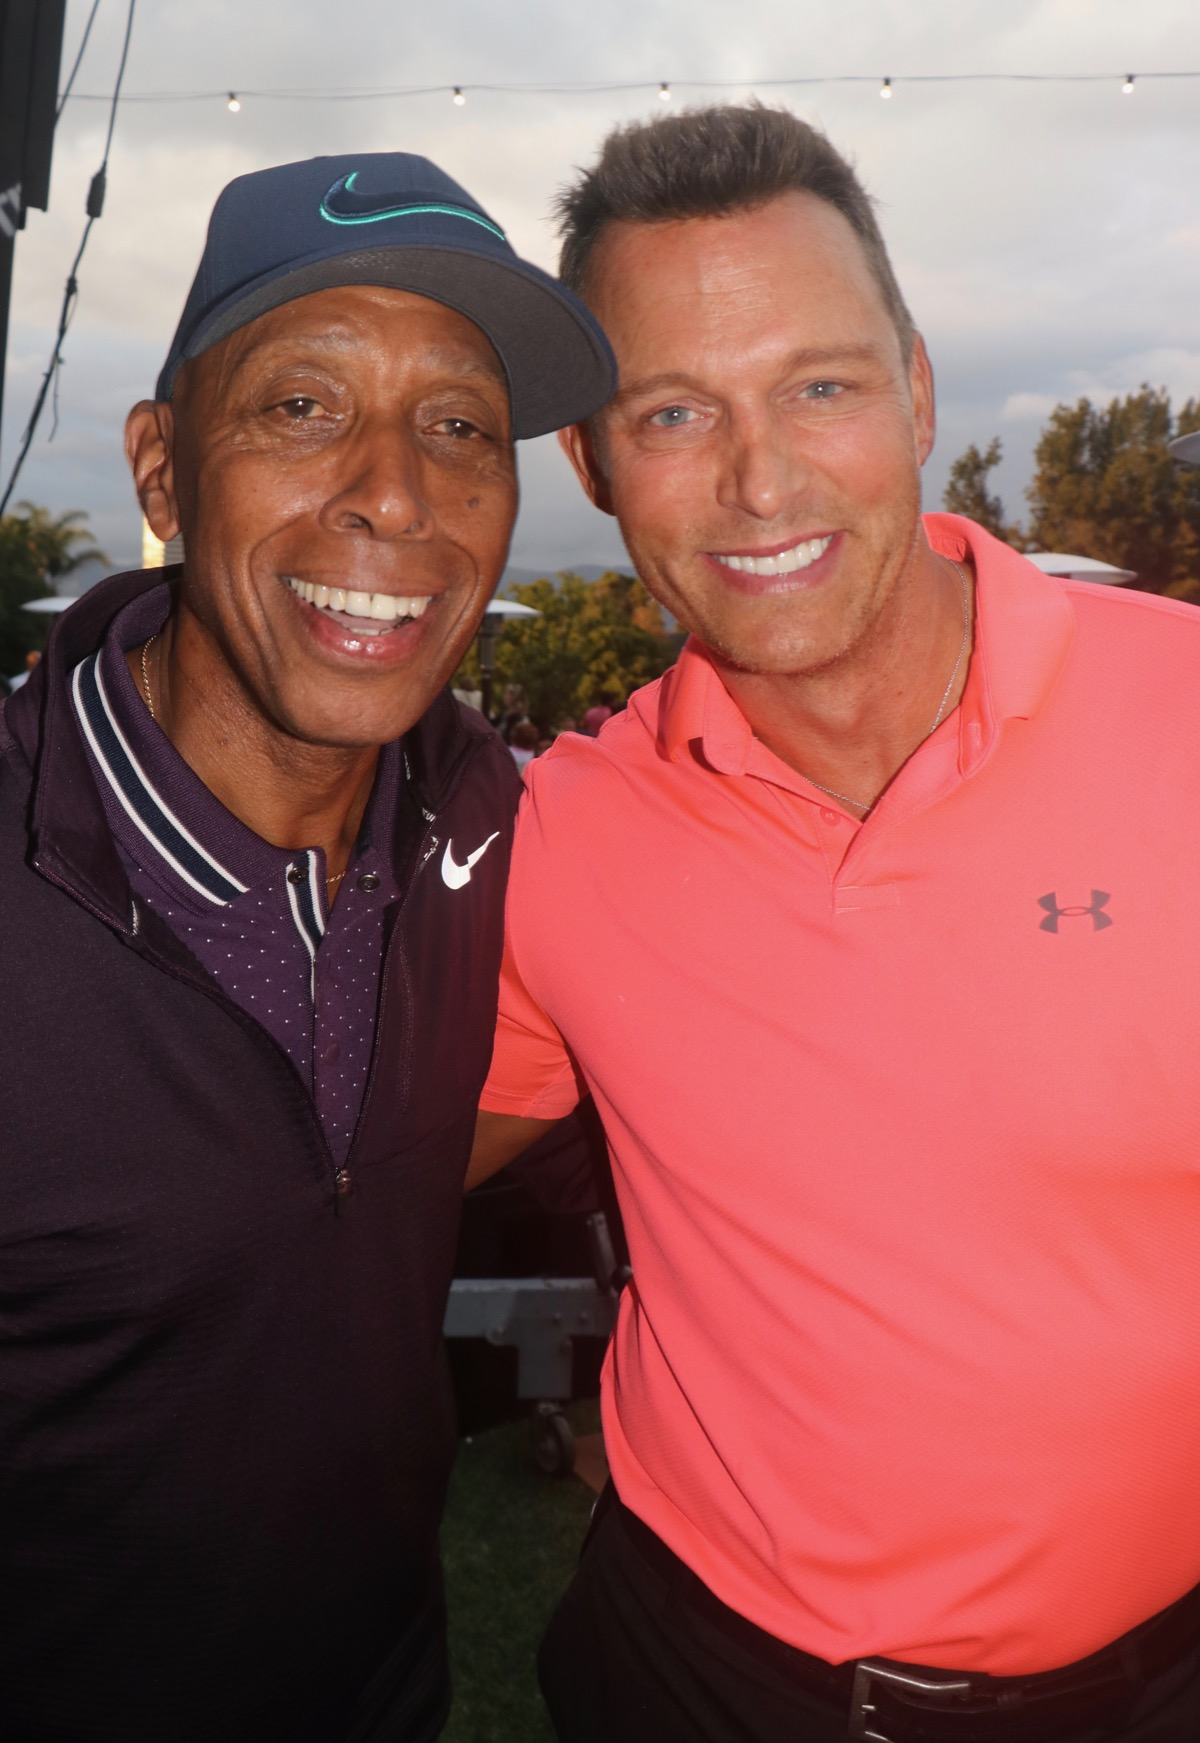 12th Annual George Lopez Celebrity Golf Classic Photos - 185.jpg